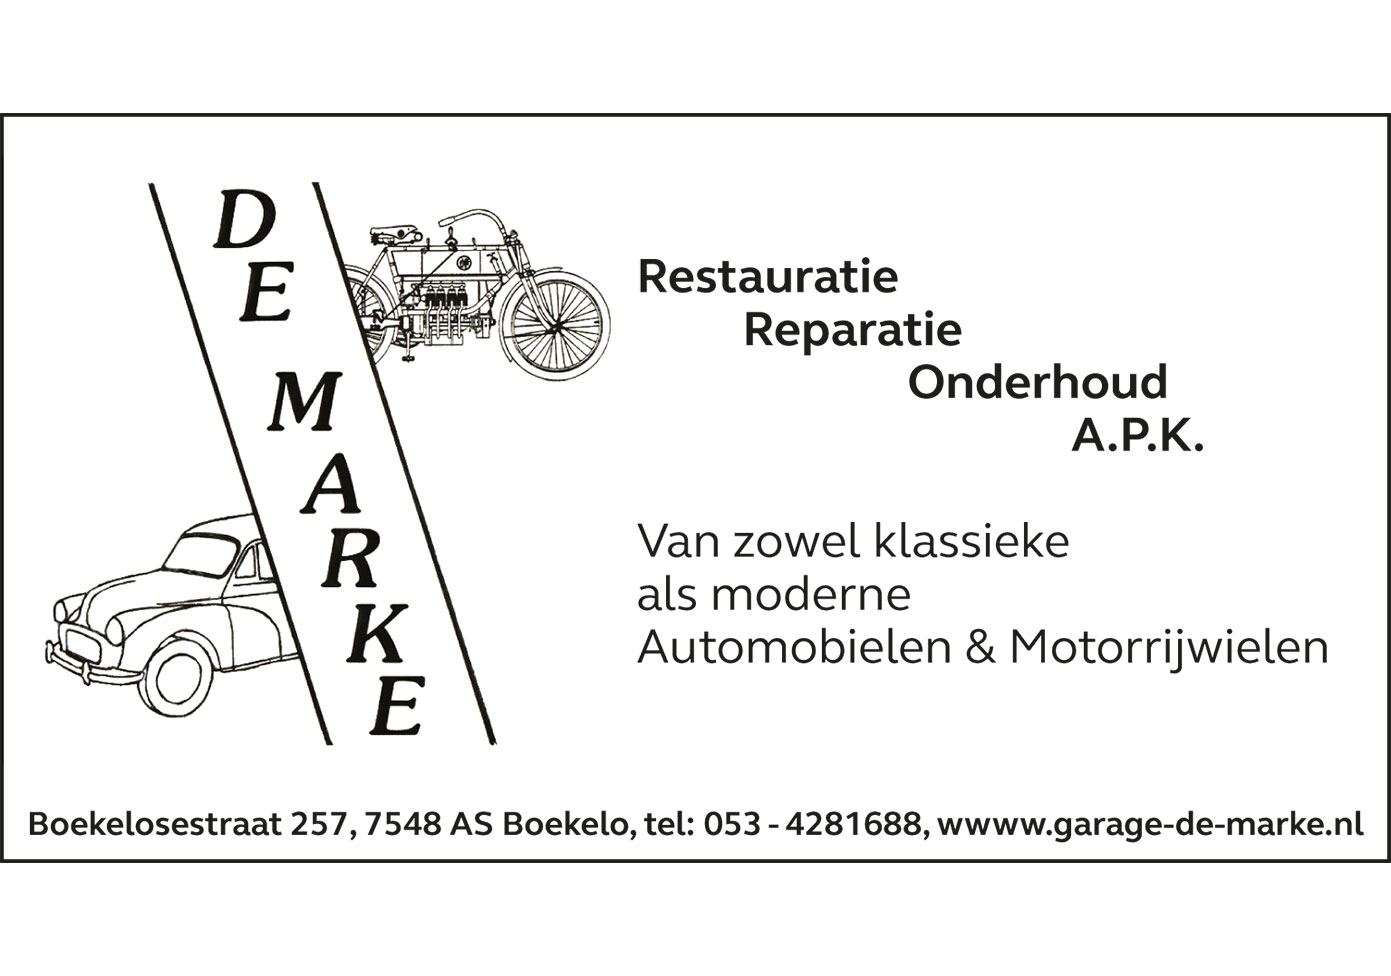 garage-de-marke